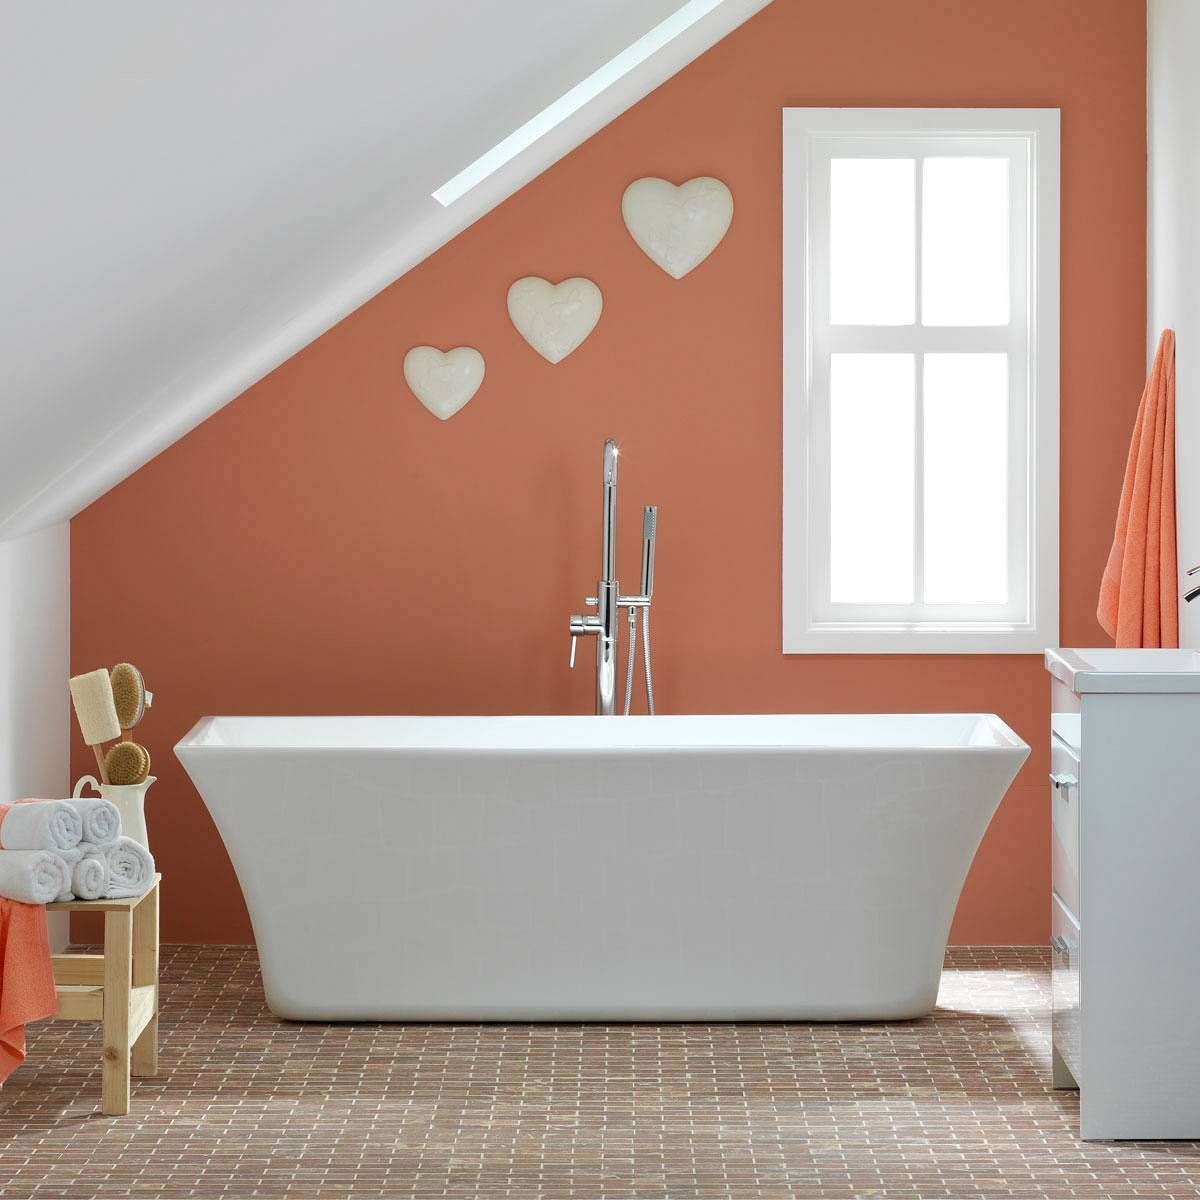 High Quality Apollo Roll Top Bath   Now £499. Www.victoriaplumb.com